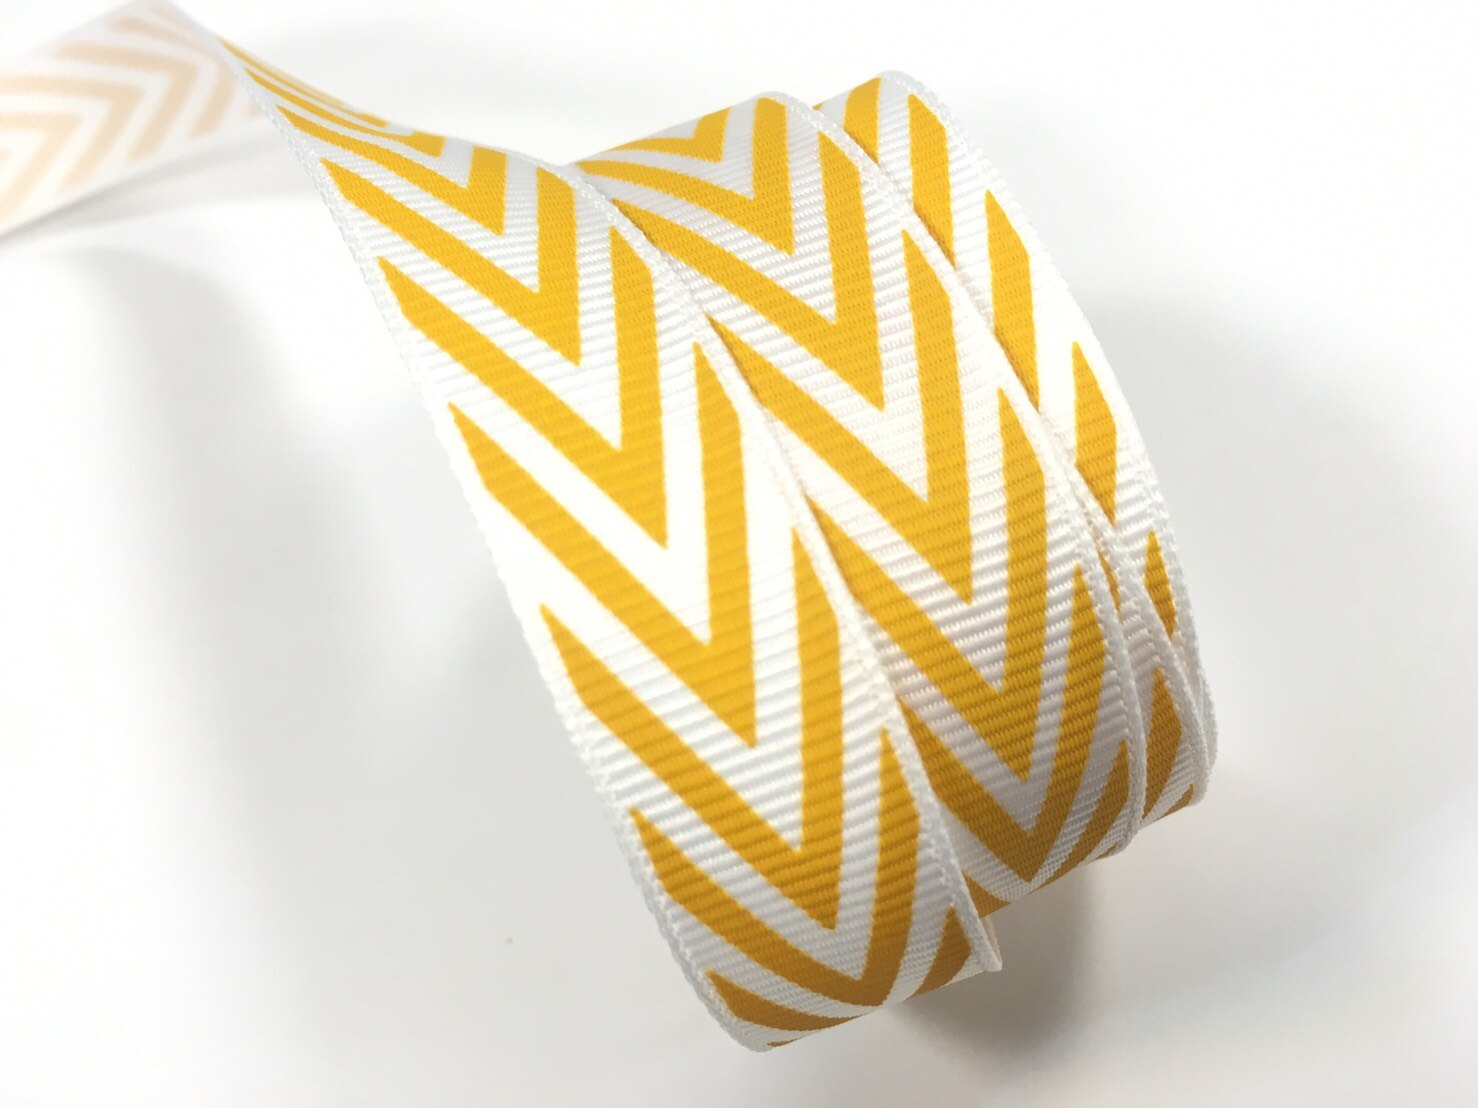 【Crystal Rose緞帶專賣店】羅紋緞帶箭頭15mm3碼裝(3色) 2